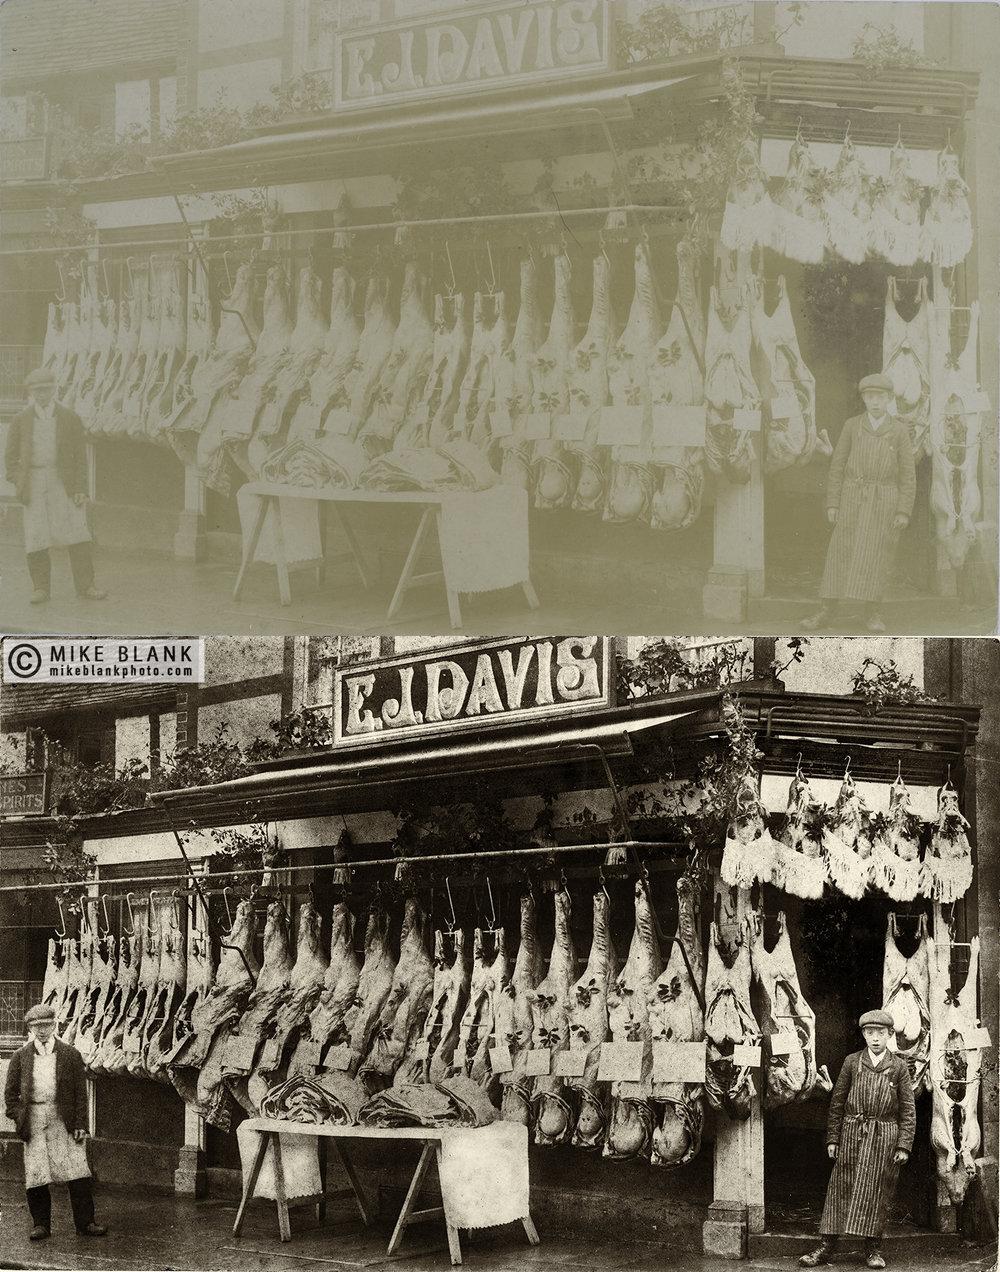 Digital restoration: EJ Davis, butcher approx 1910 (?)